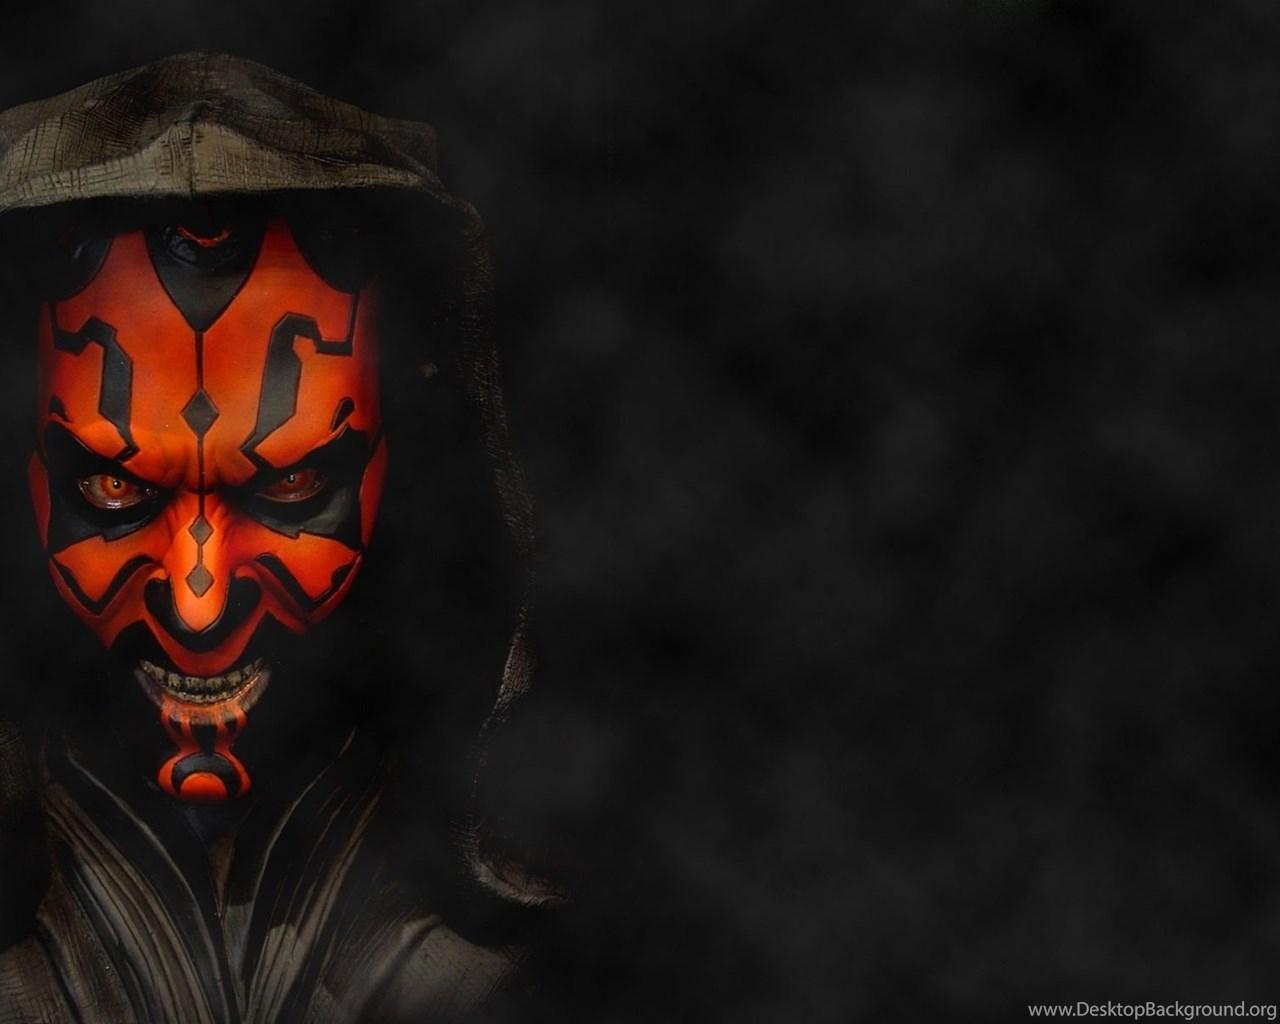 Darth Maul Star Wars Wallpapers Hd Wallpapers Expert Desktop